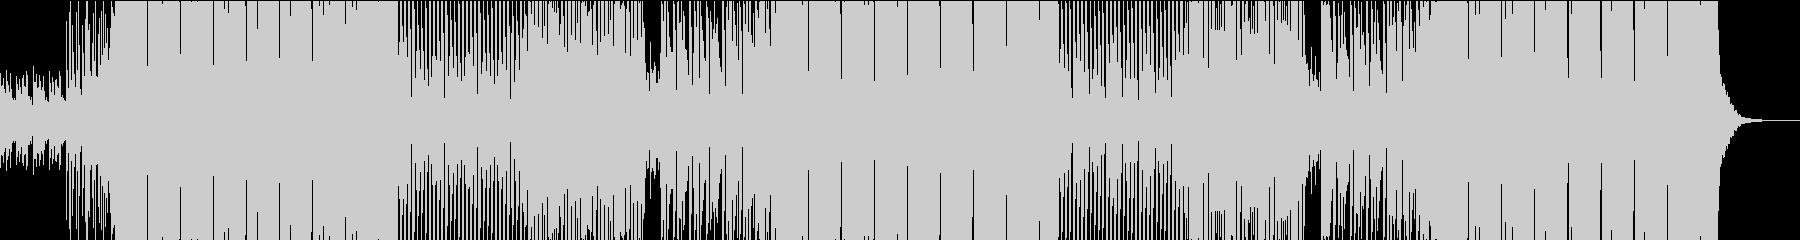 TikTok/YouTube/動画BGMの未再生の波形